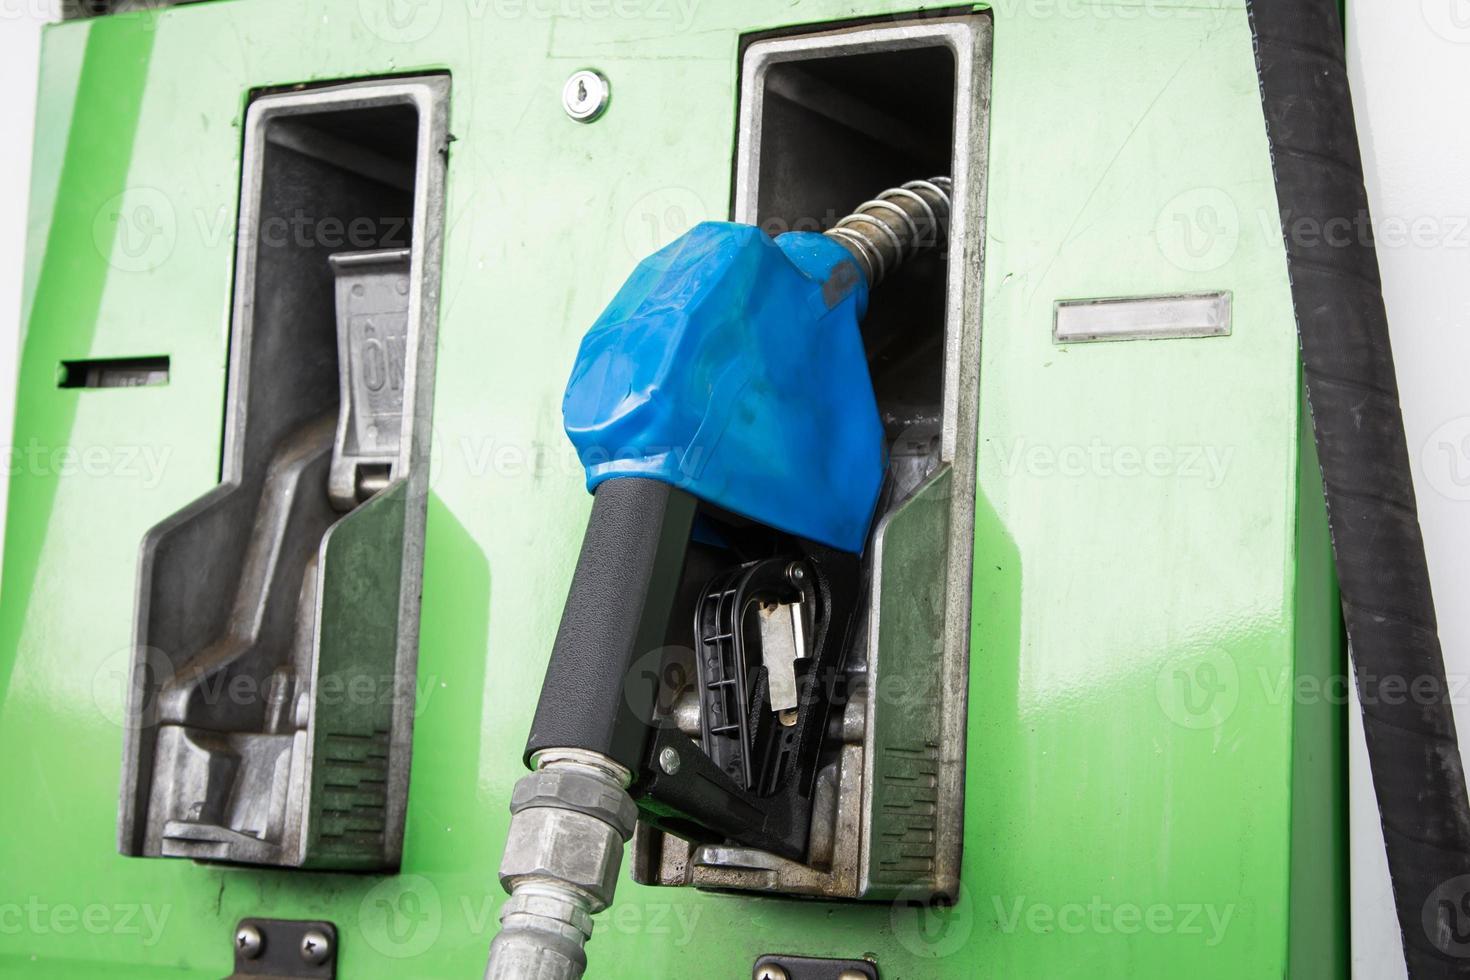 benzinepomppijpen in benzinestation foto